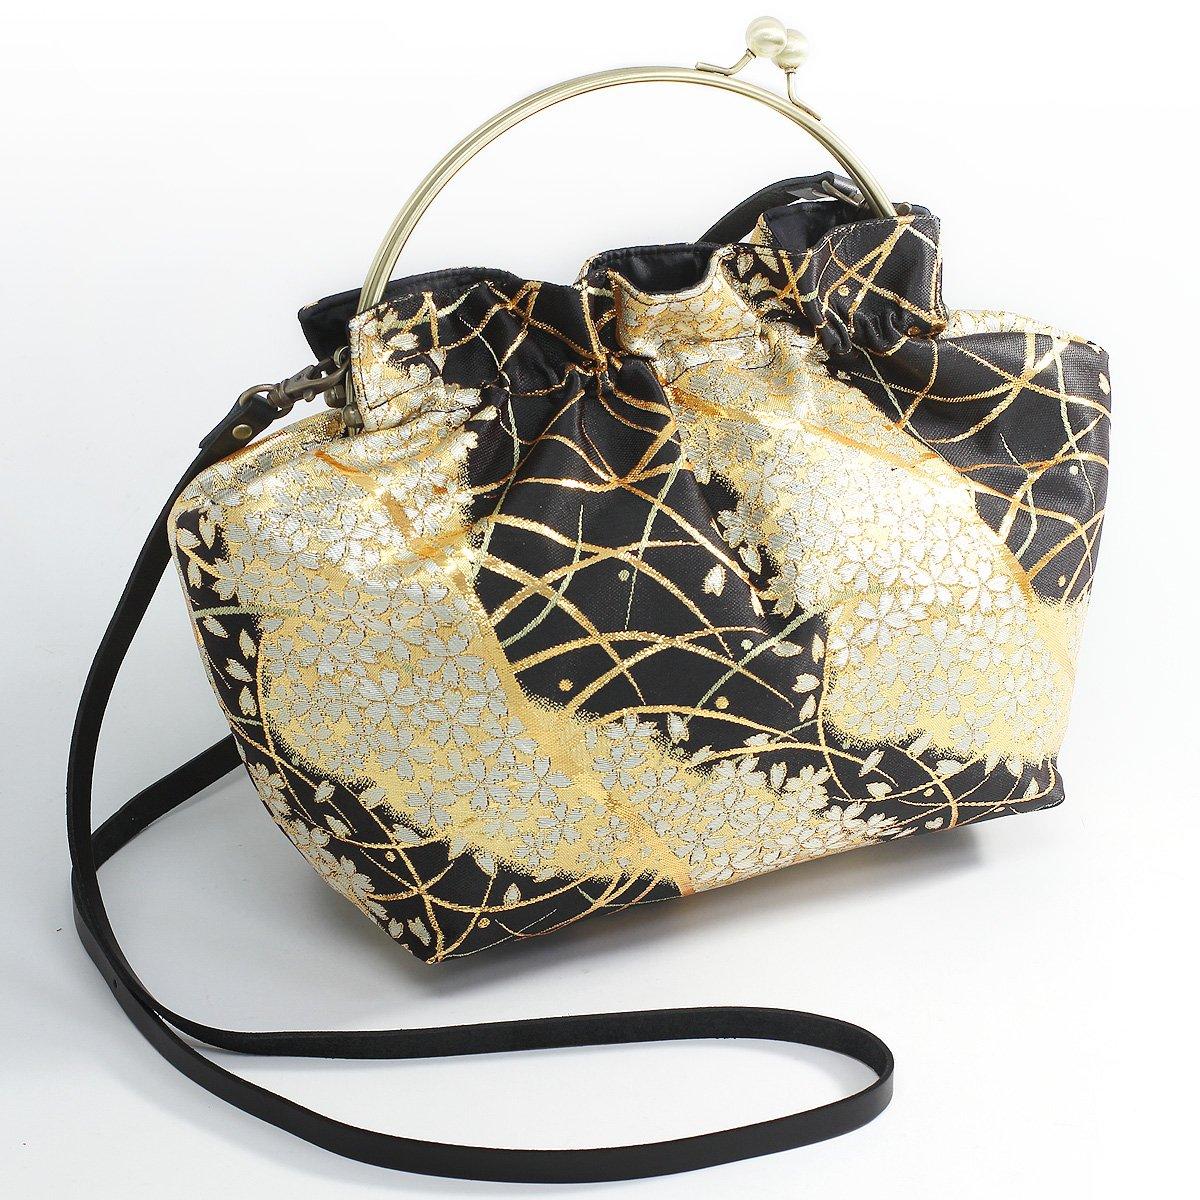 Mieko Women's Japanese Style Bag Traditional Kimono Nishijin-Ori Sakura (Made in Kyoto Japan) by Mieko